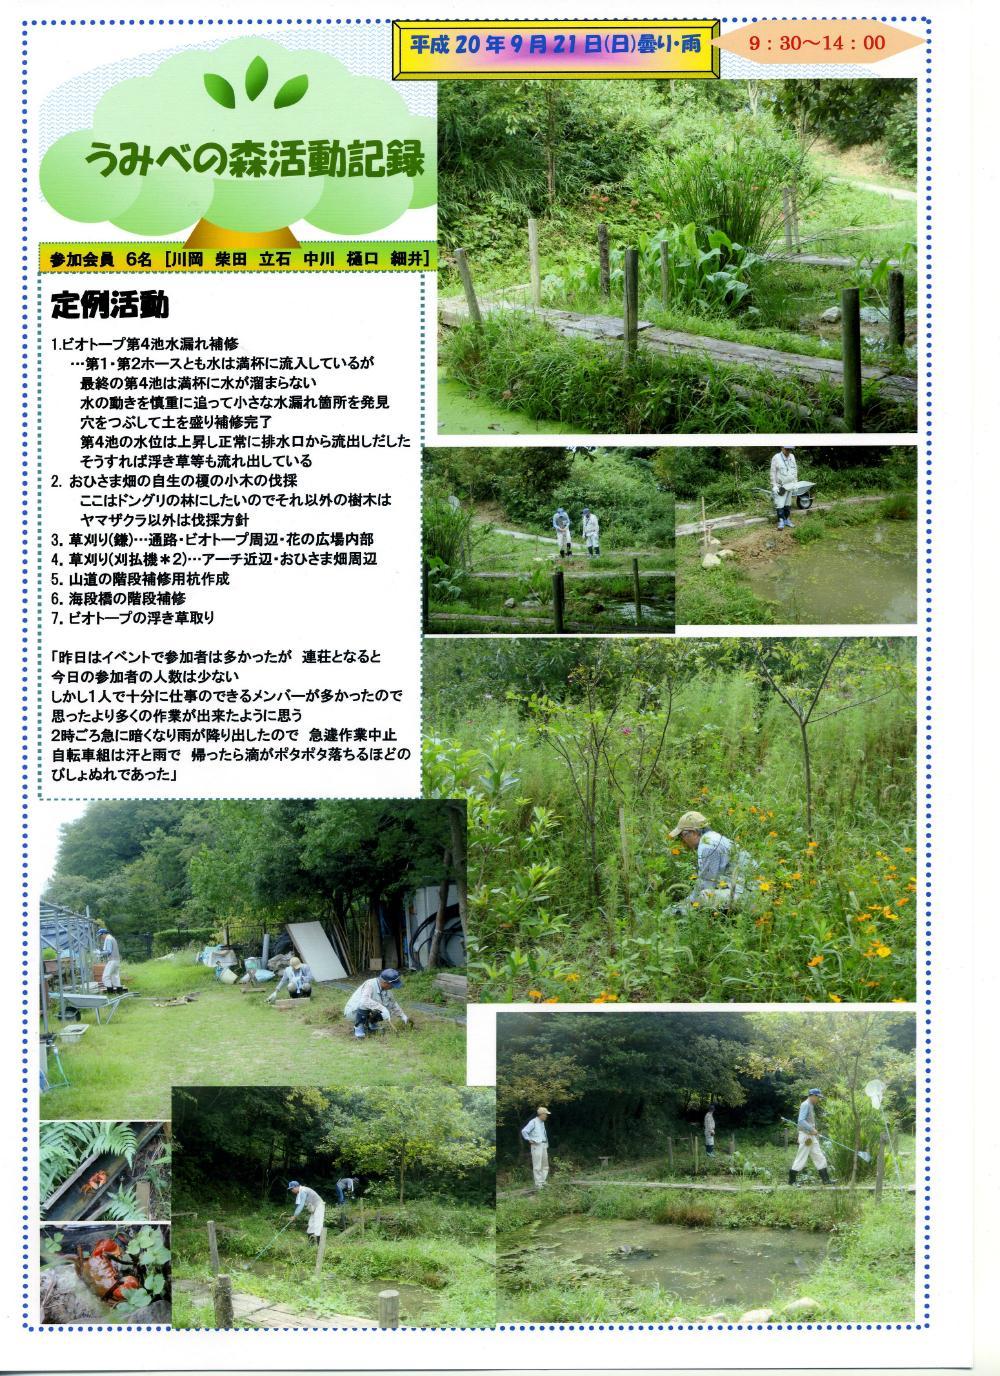 水漏れ補修・・・定例活動日_c0108460_1865773.jpg